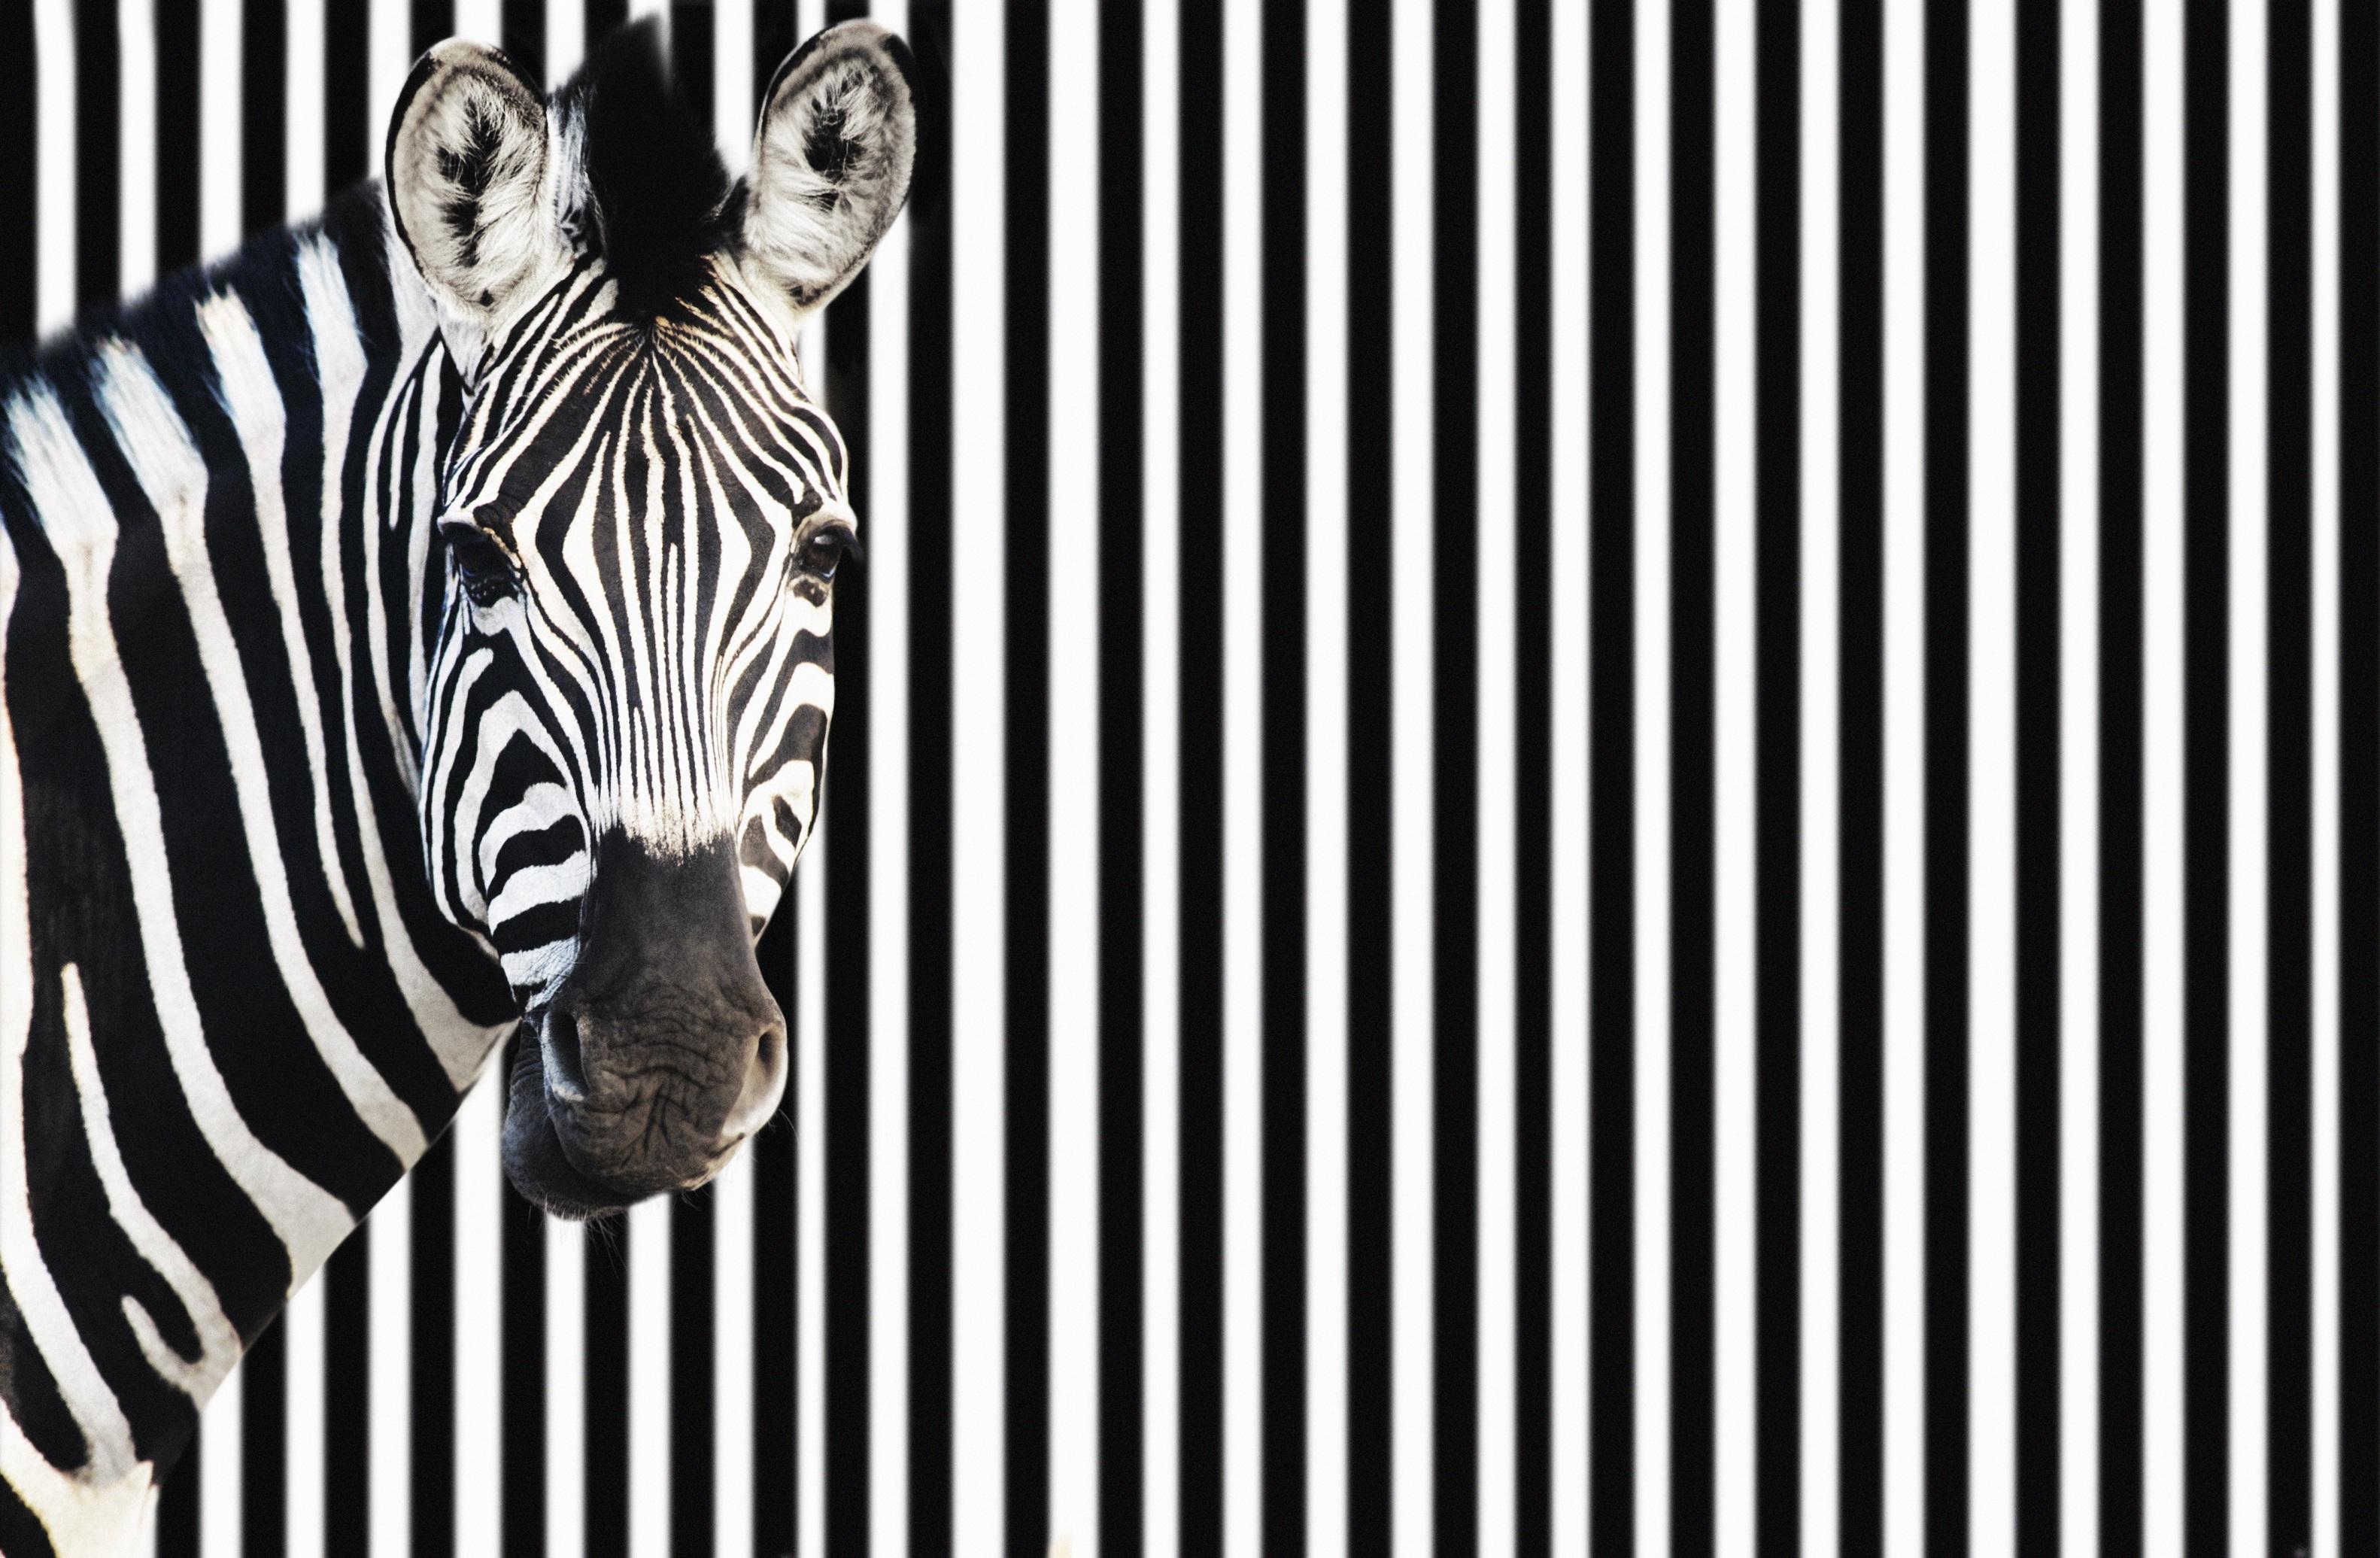 Zebra against background of black and white stripes